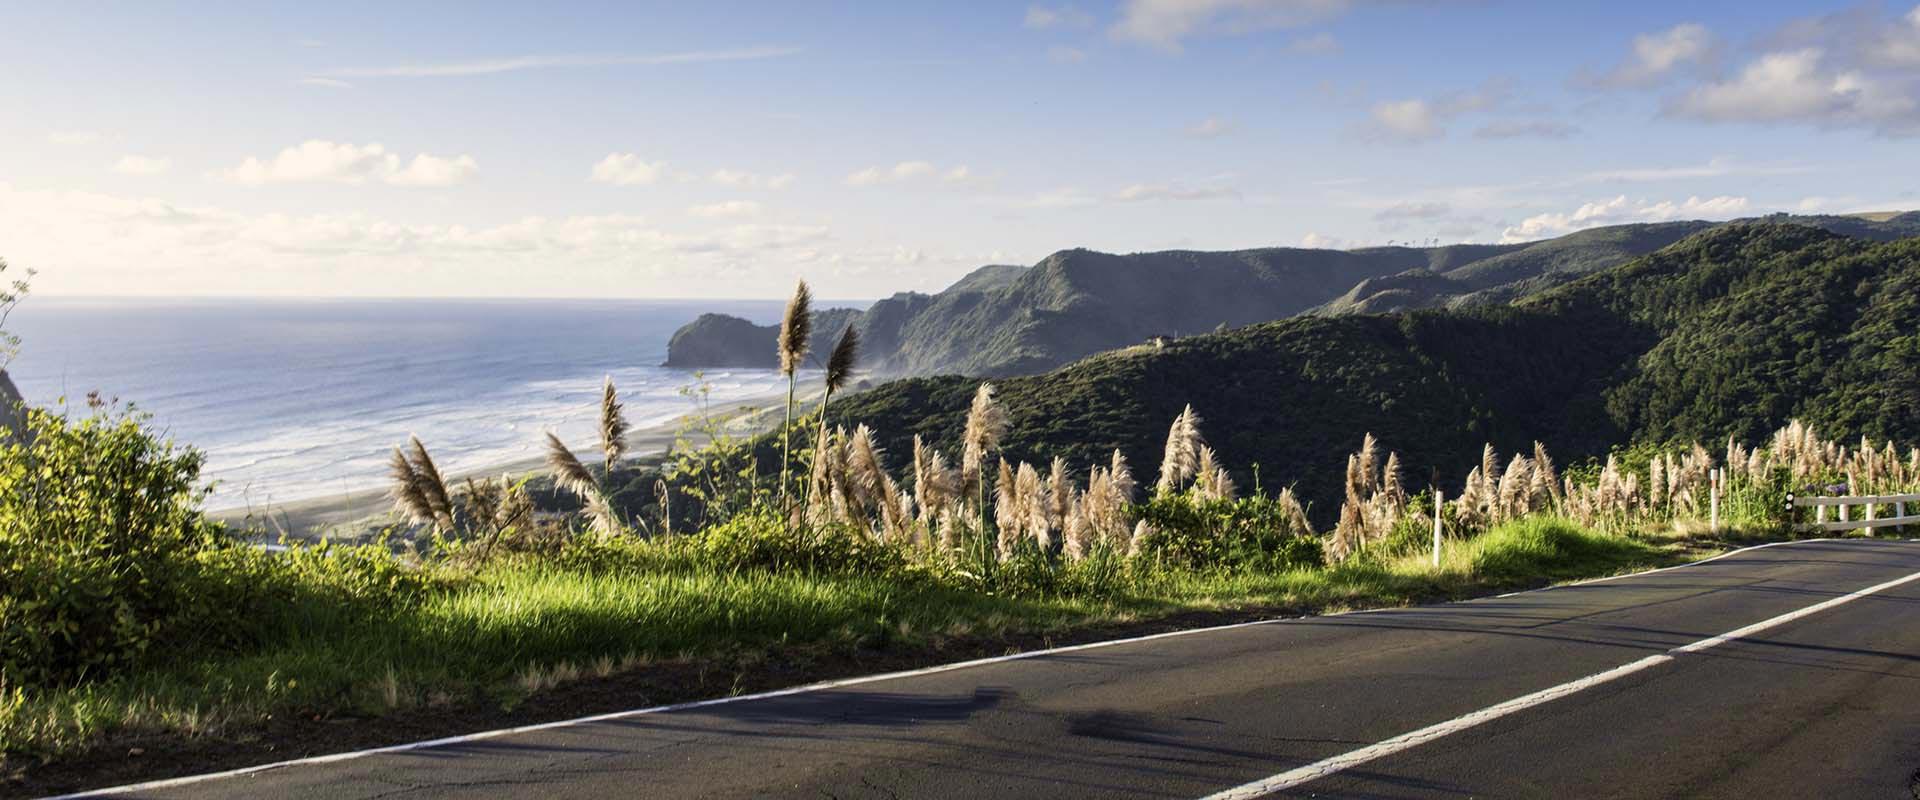 New Zealand Public Holidays 2020 - PublicHolidays.co.nz